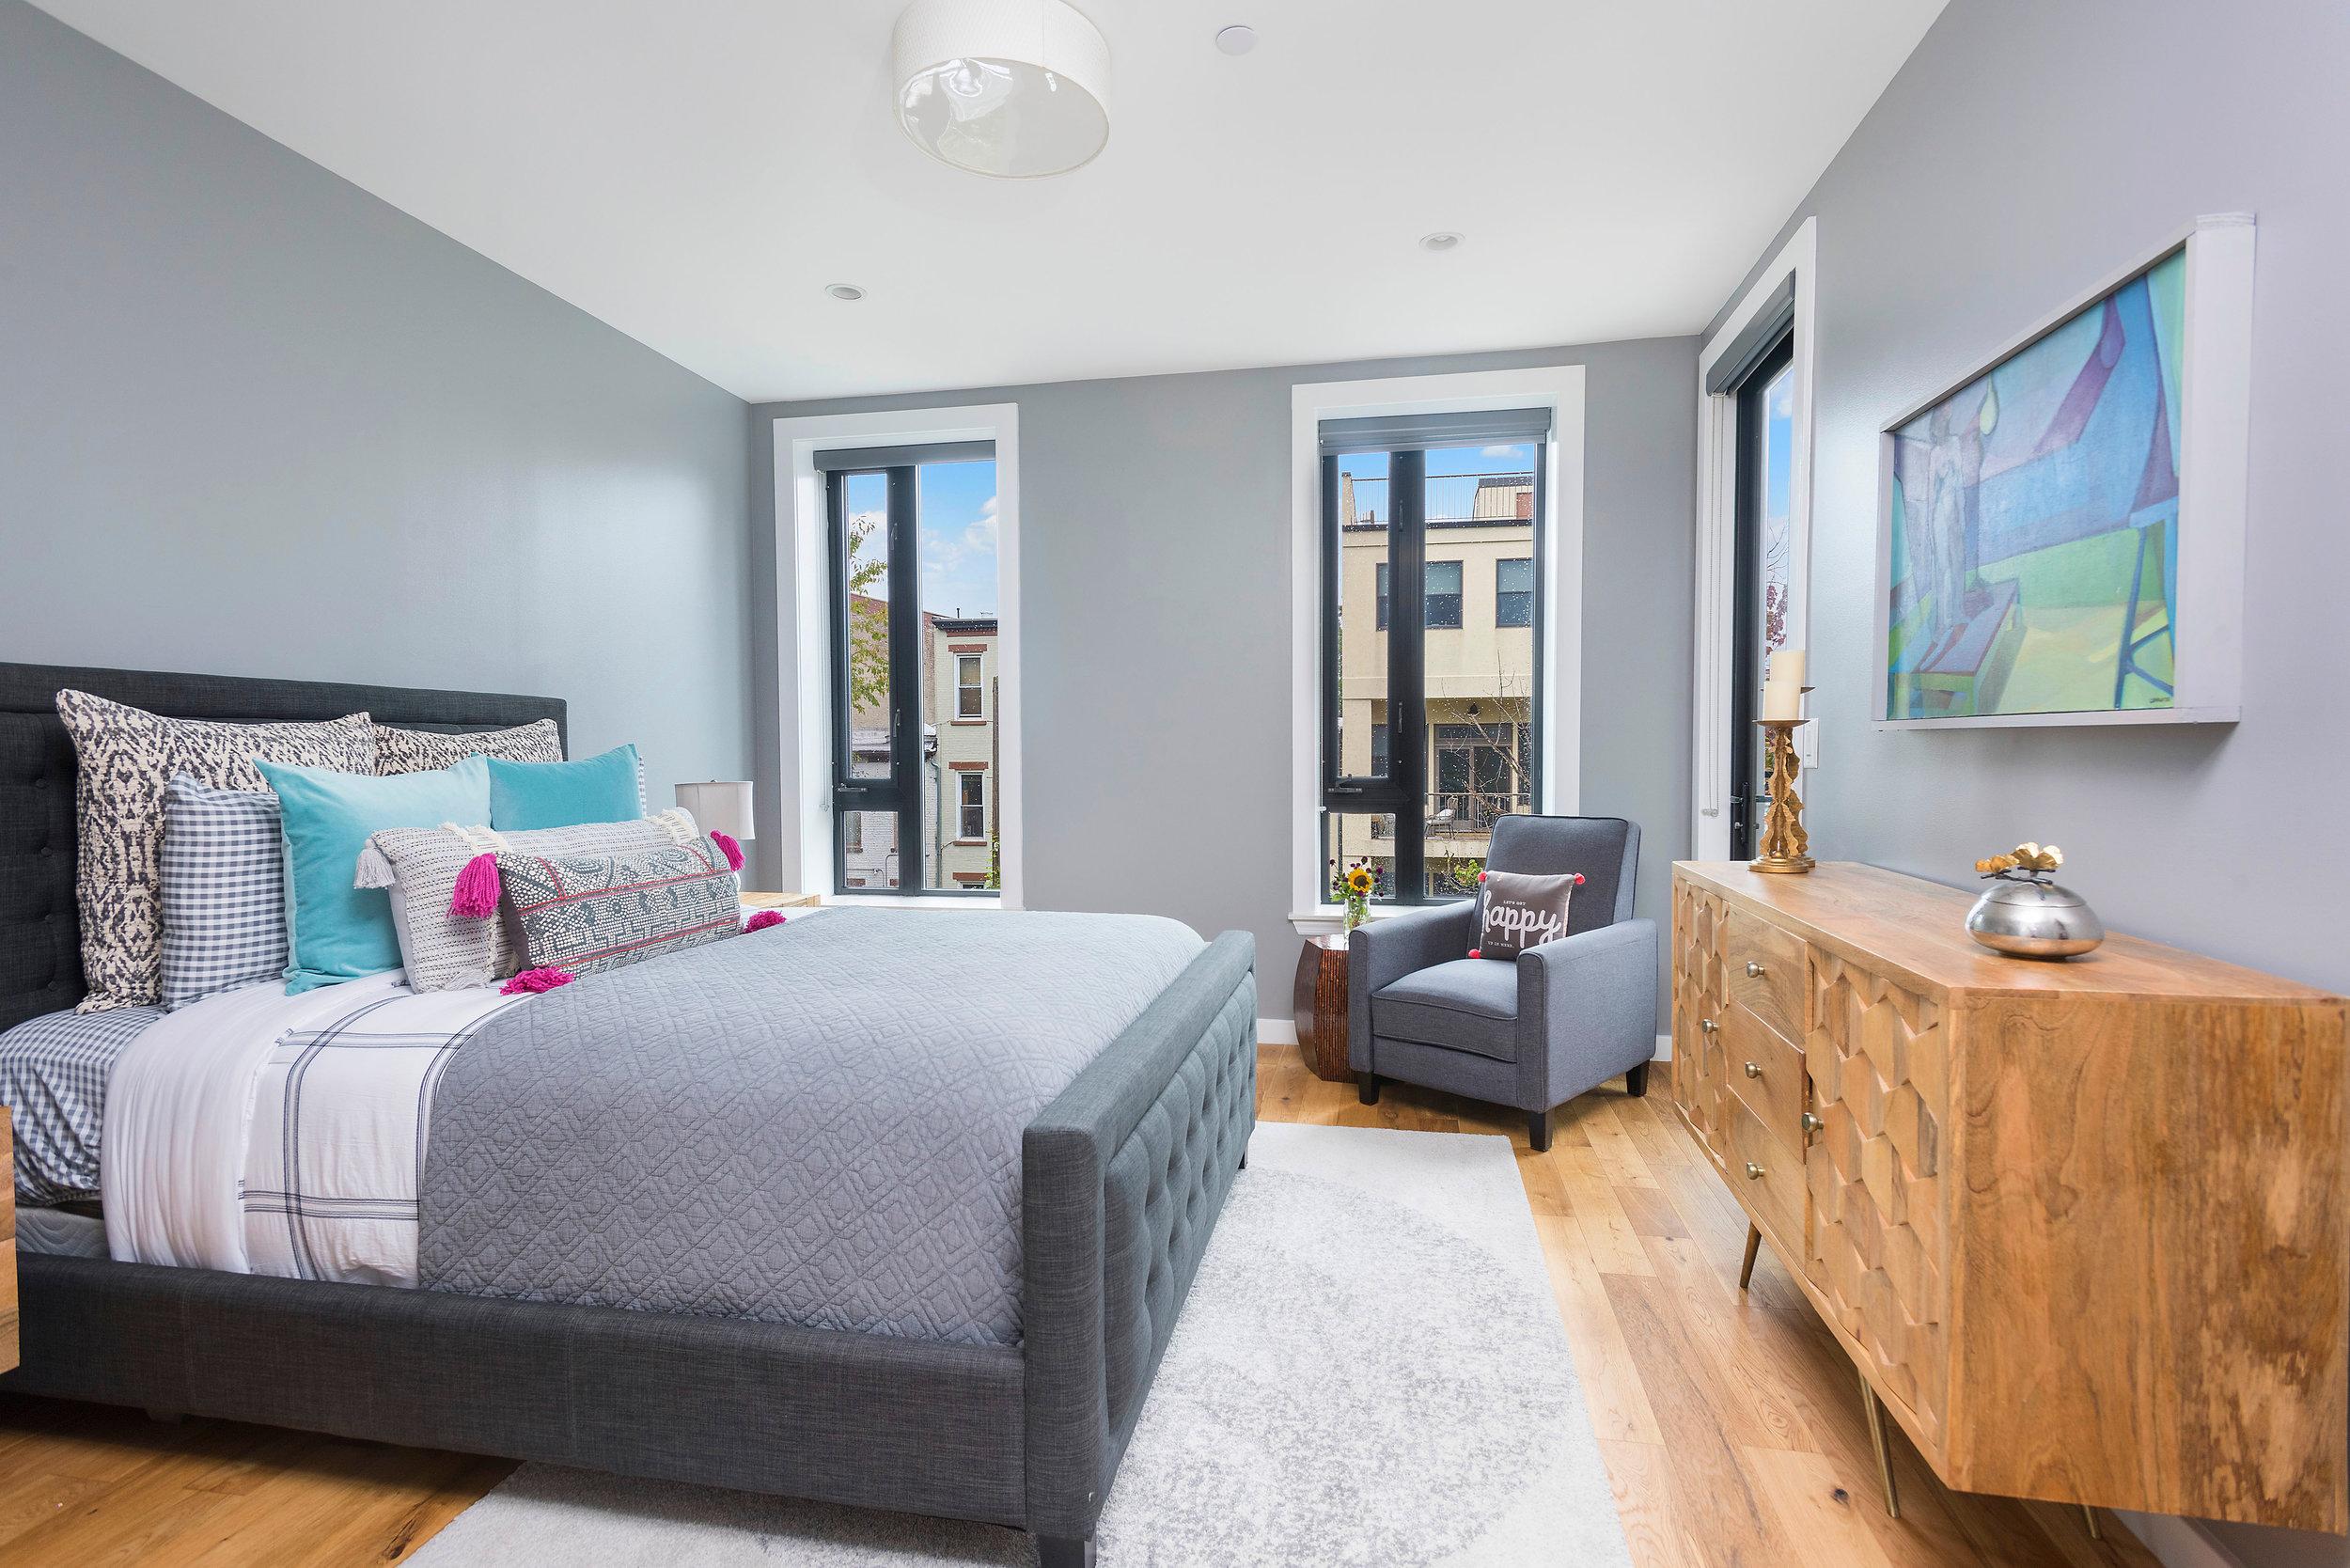 Bedrooms - Get Started